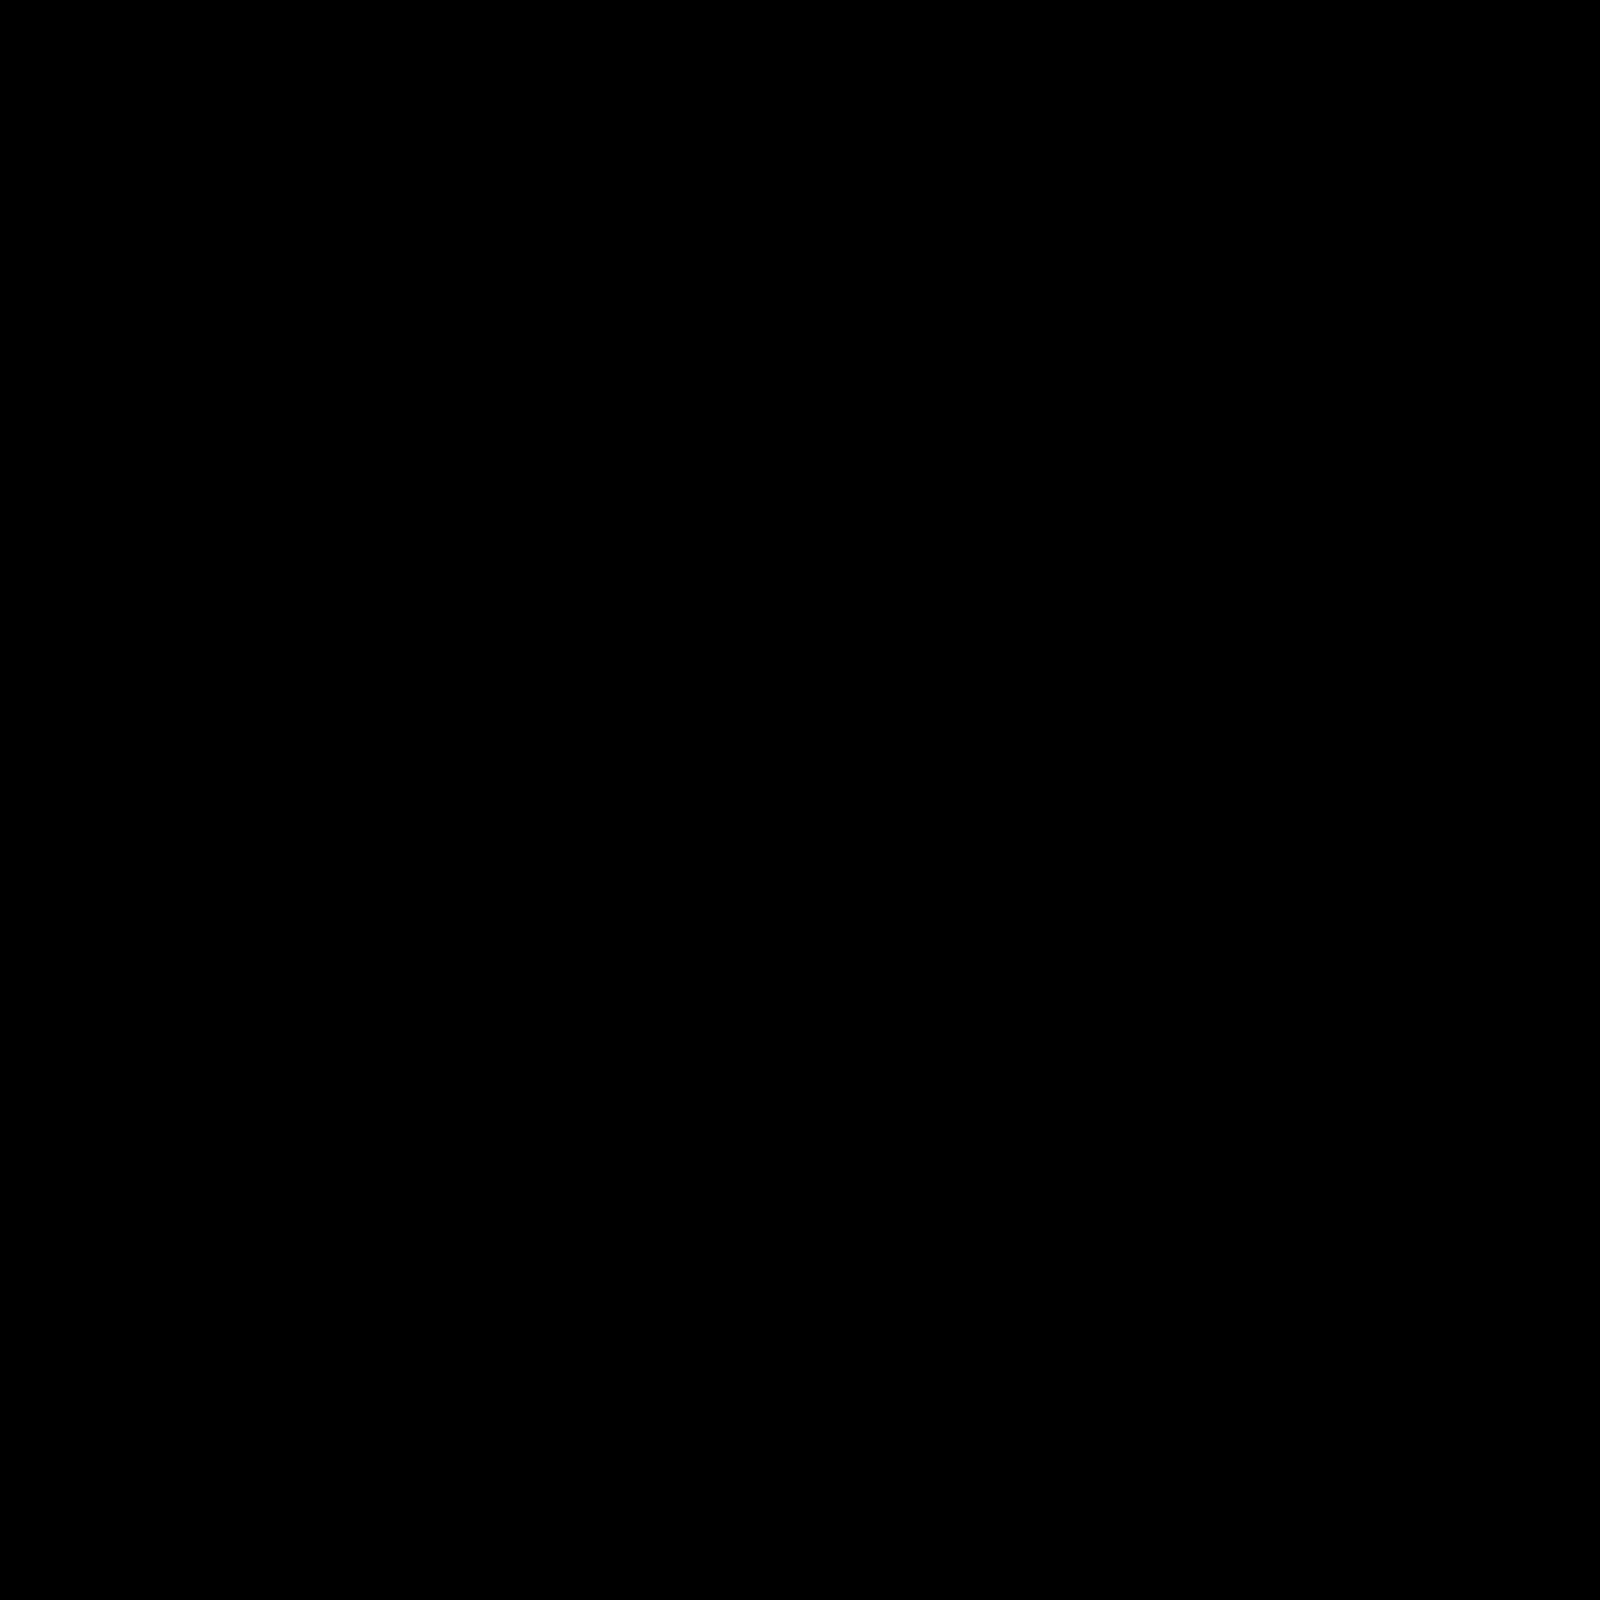 Akshardham icon